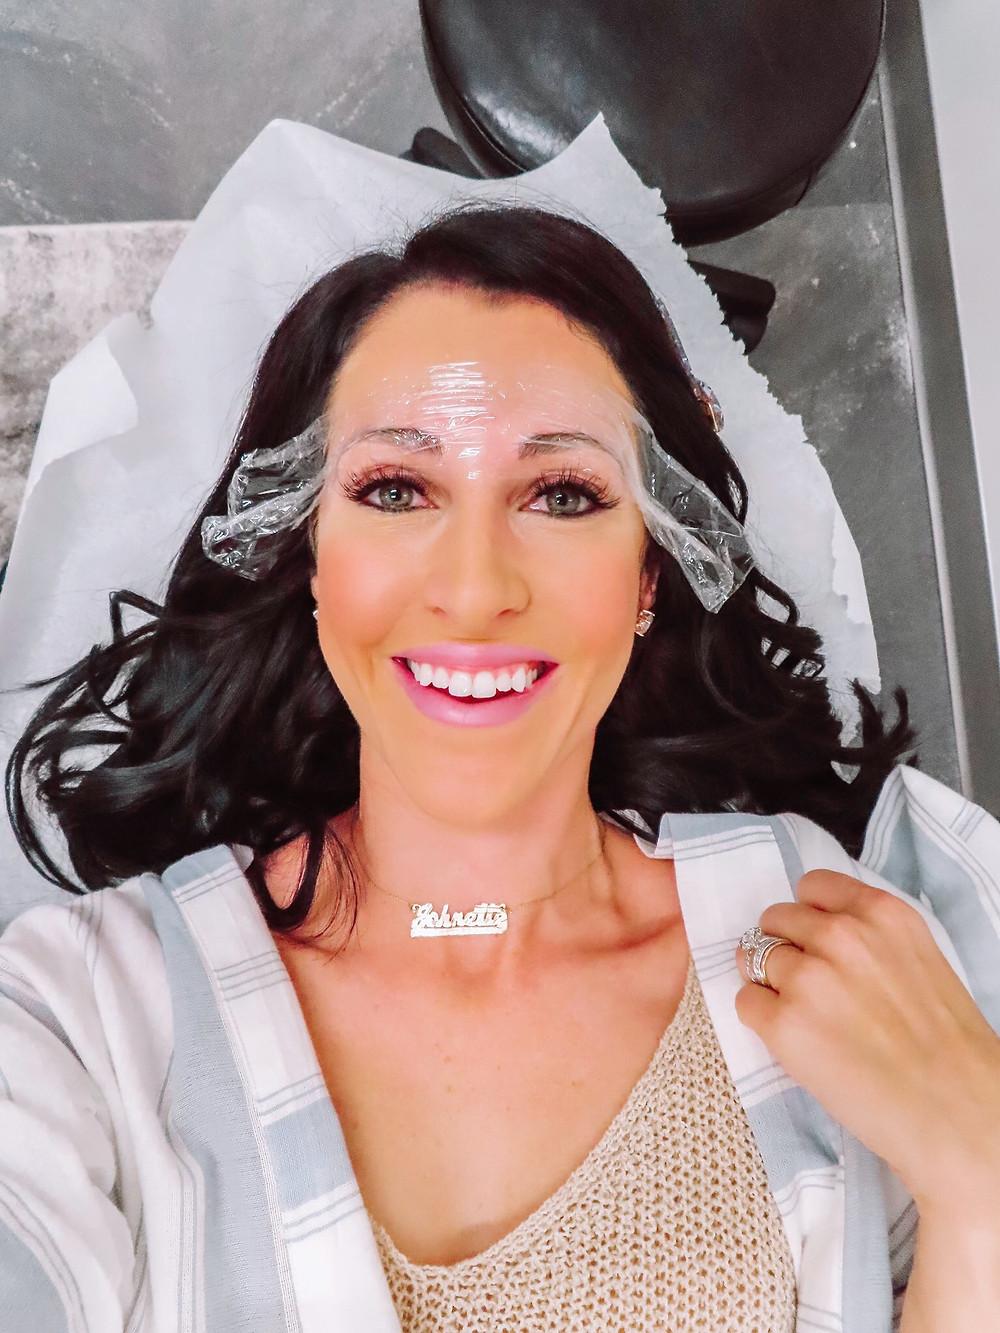 Indianapolis microblading, indy microblading, eyebrows, microblading, combination brows, brow Inspo, Indianapolis blogger